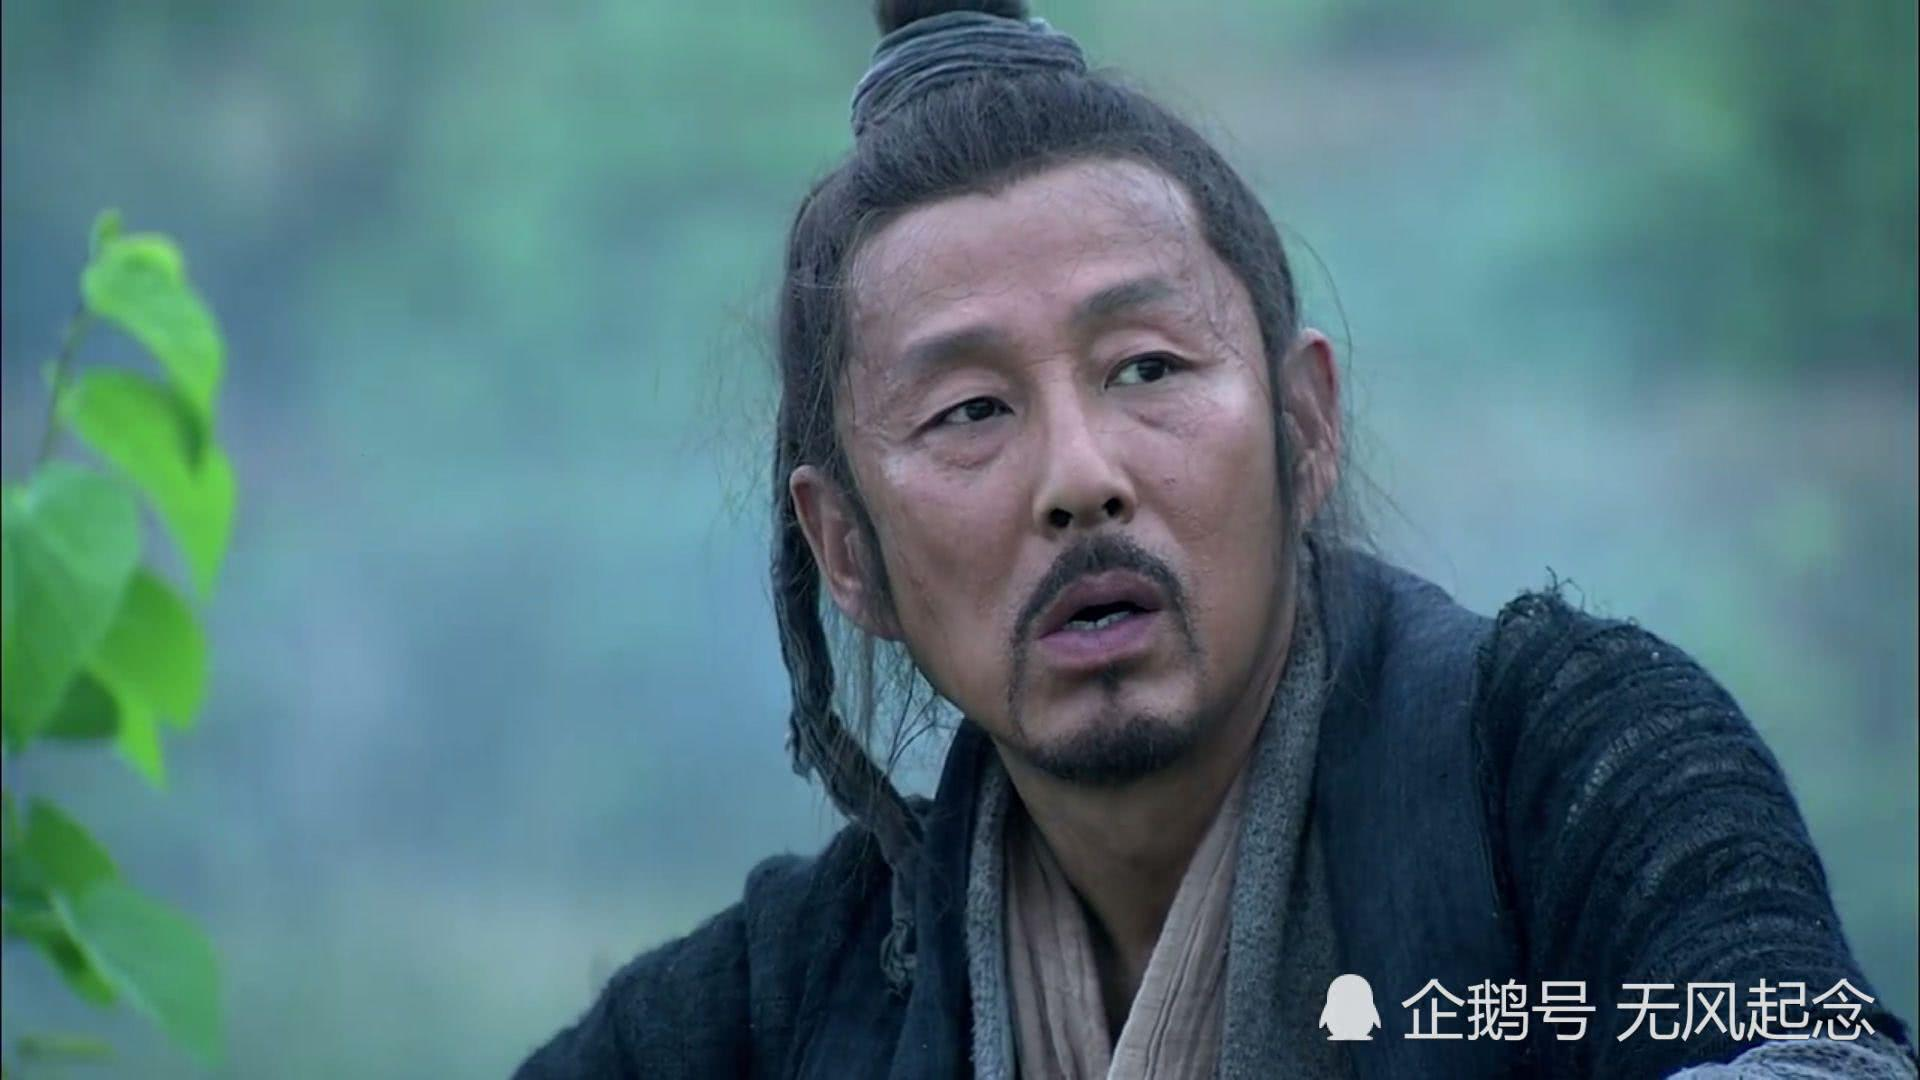 <b>若项羽回到了江东,刘邦的汉朝还能建立起来吗?</b>